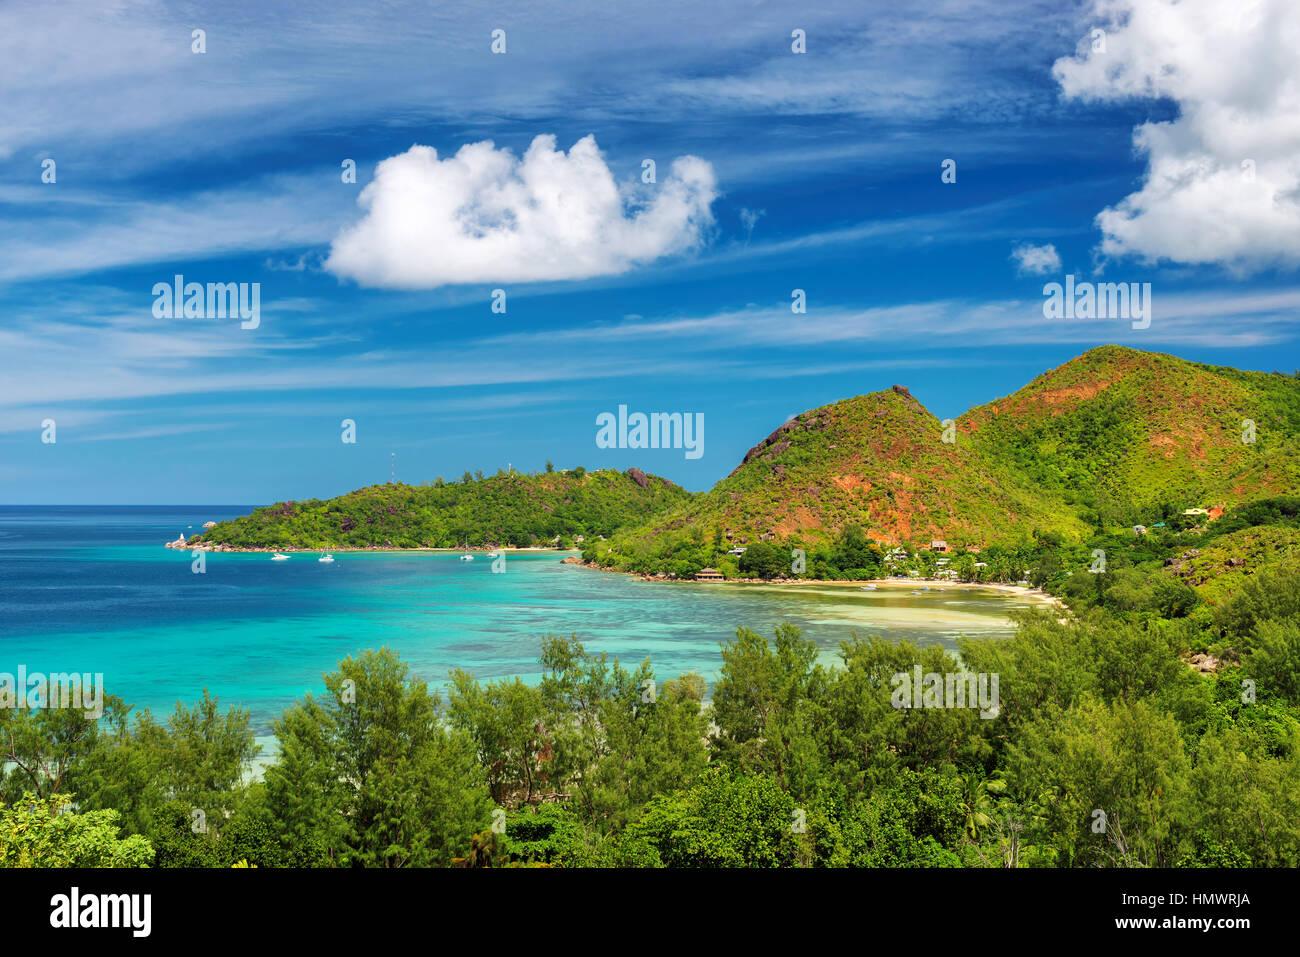 Praslin island at Seychelles - Stock Image